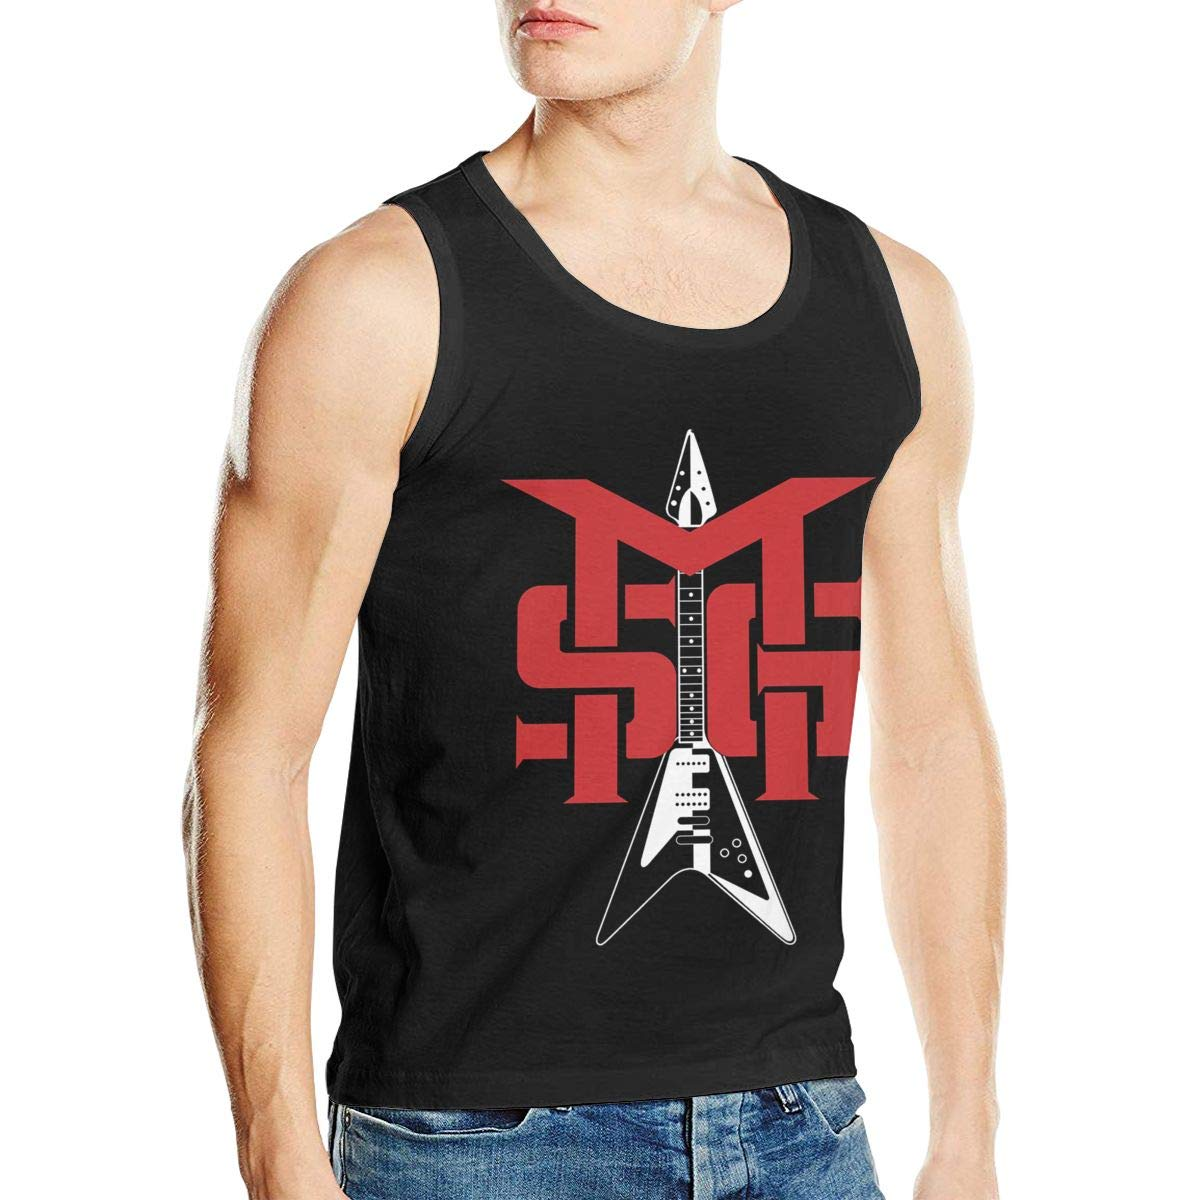 Thomlarryca Michael Schenker S Exercise Ness Shirts Premium Tank Top Black